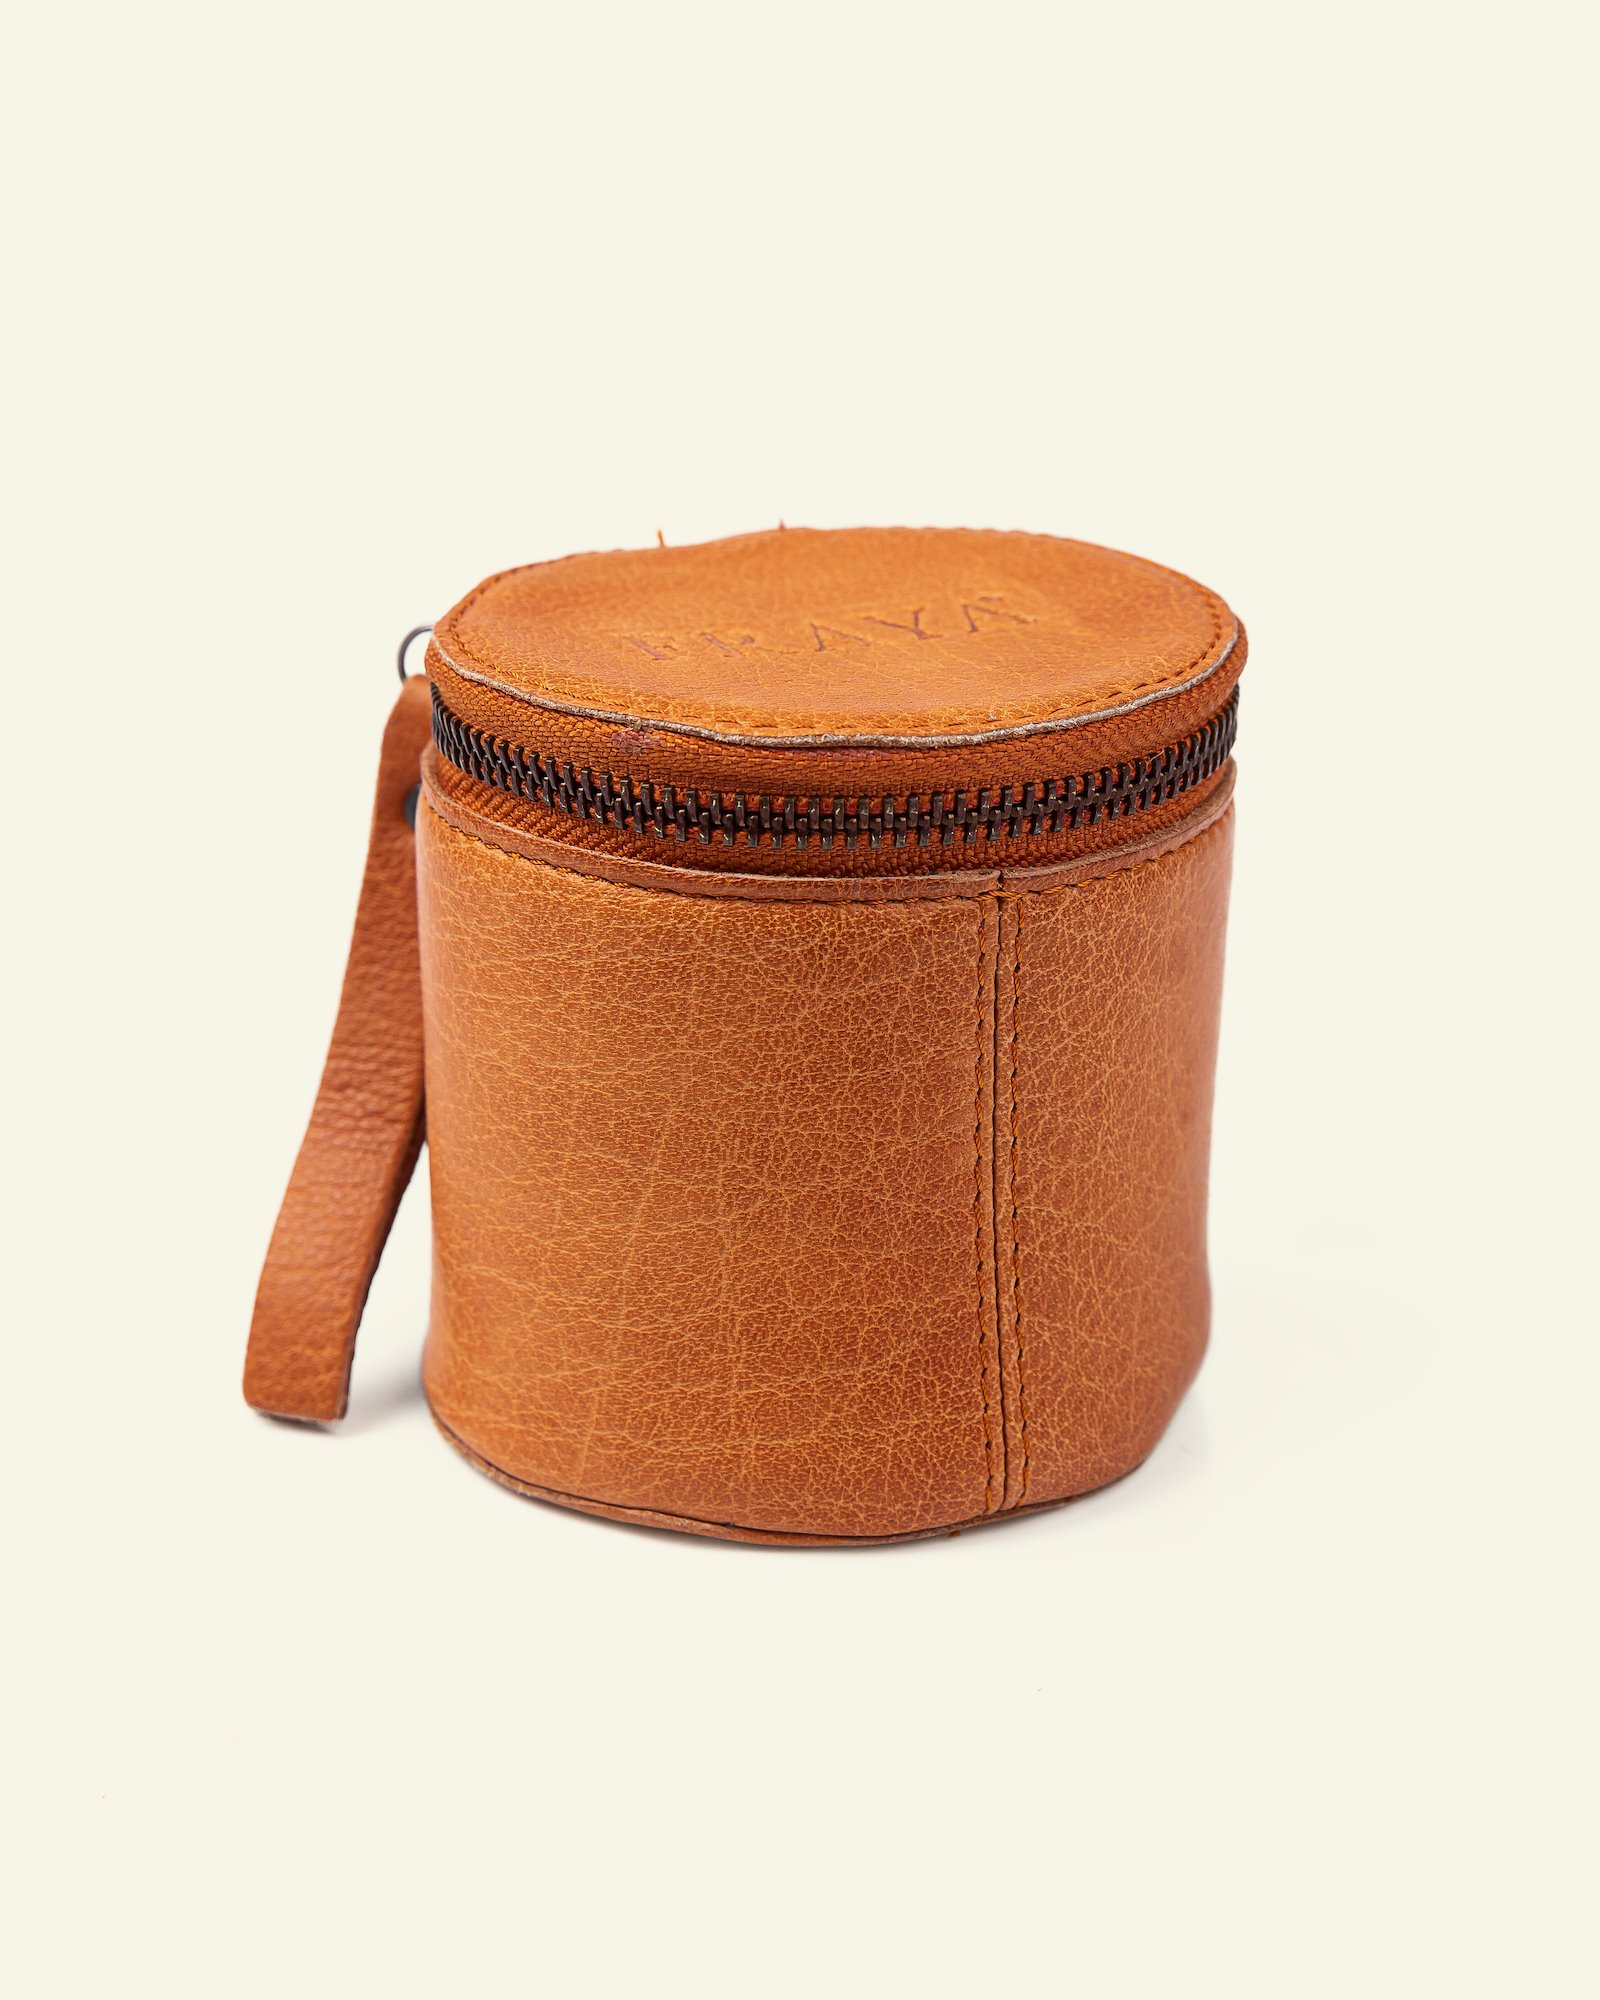 FRAYA leather cube Ø:9xH:8cm brown